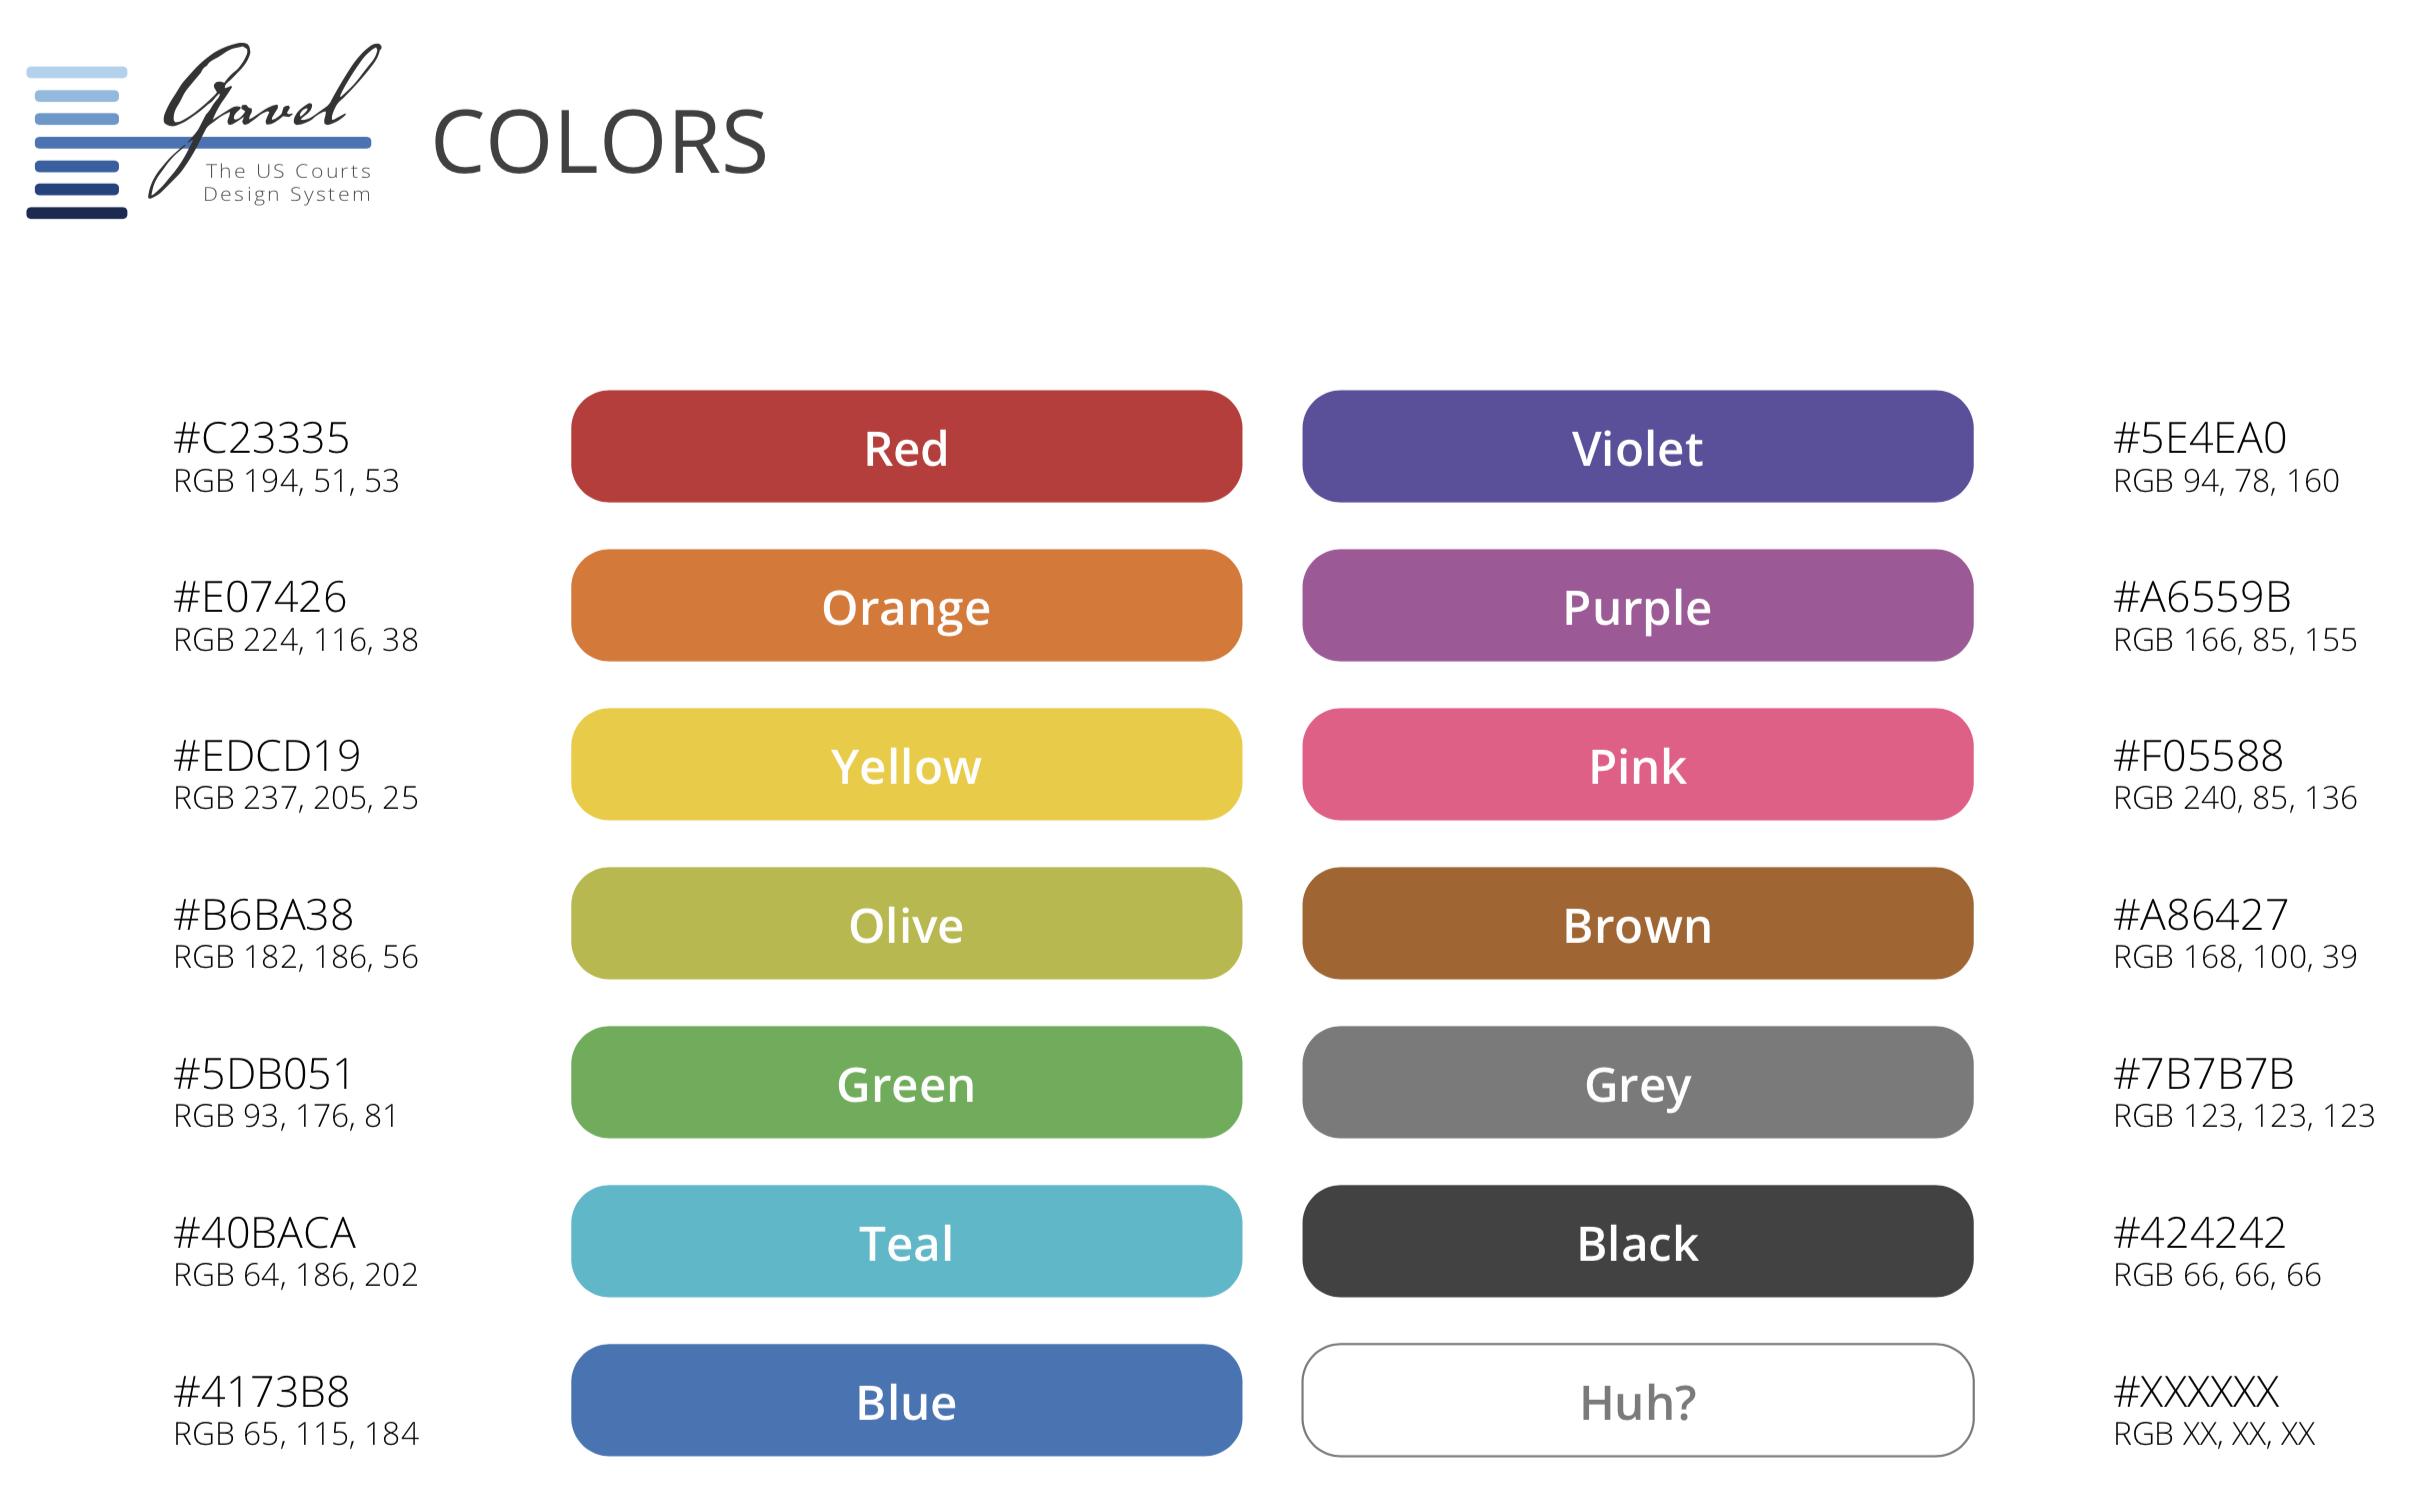 Design system colors